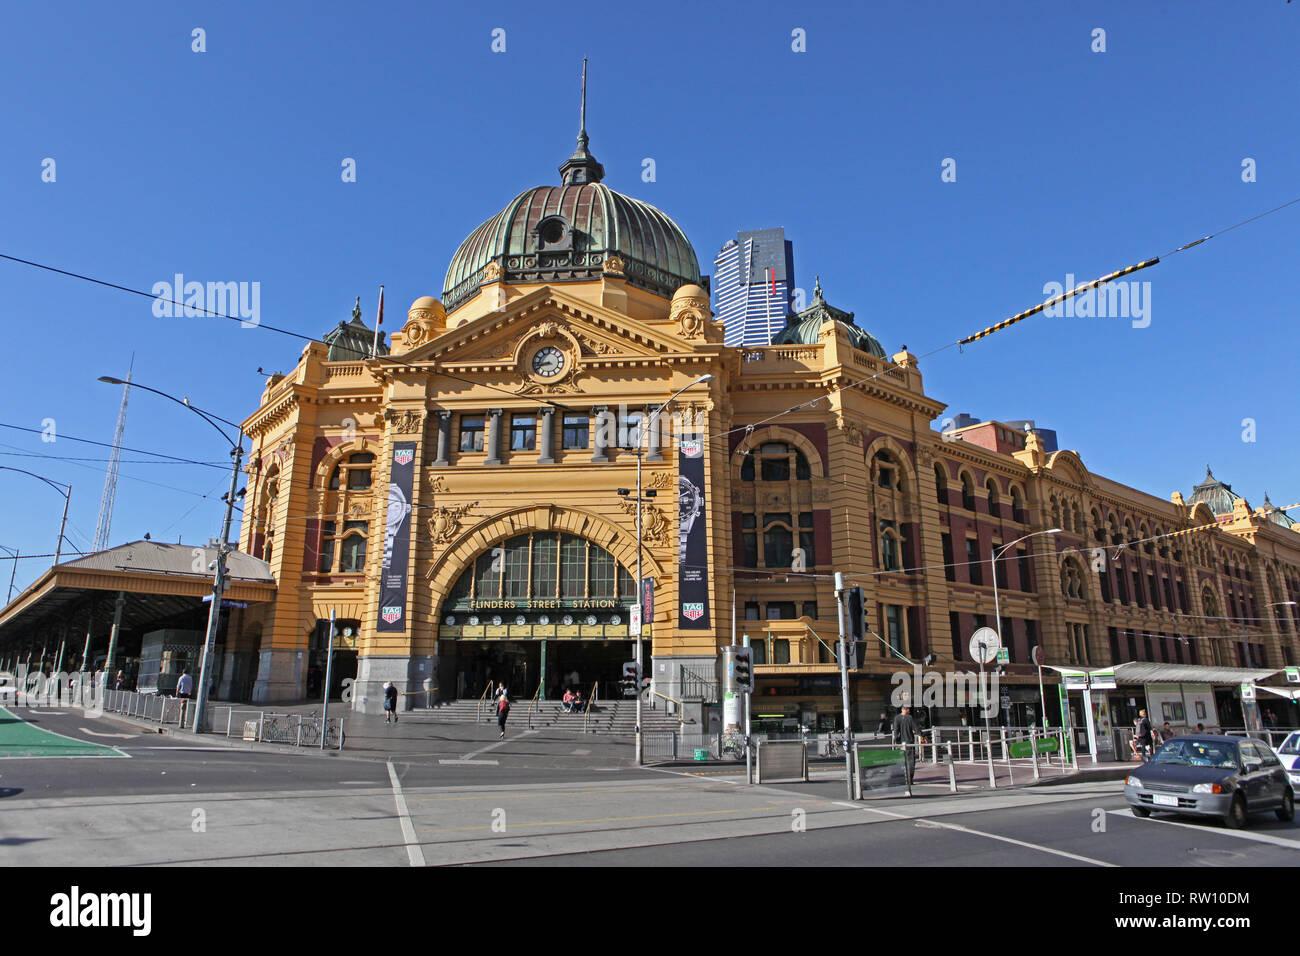 Visit Australia.  Scenics and views of Australia.  Flinders Street Station. Melbourne, Victoria. Australia Stock Photo